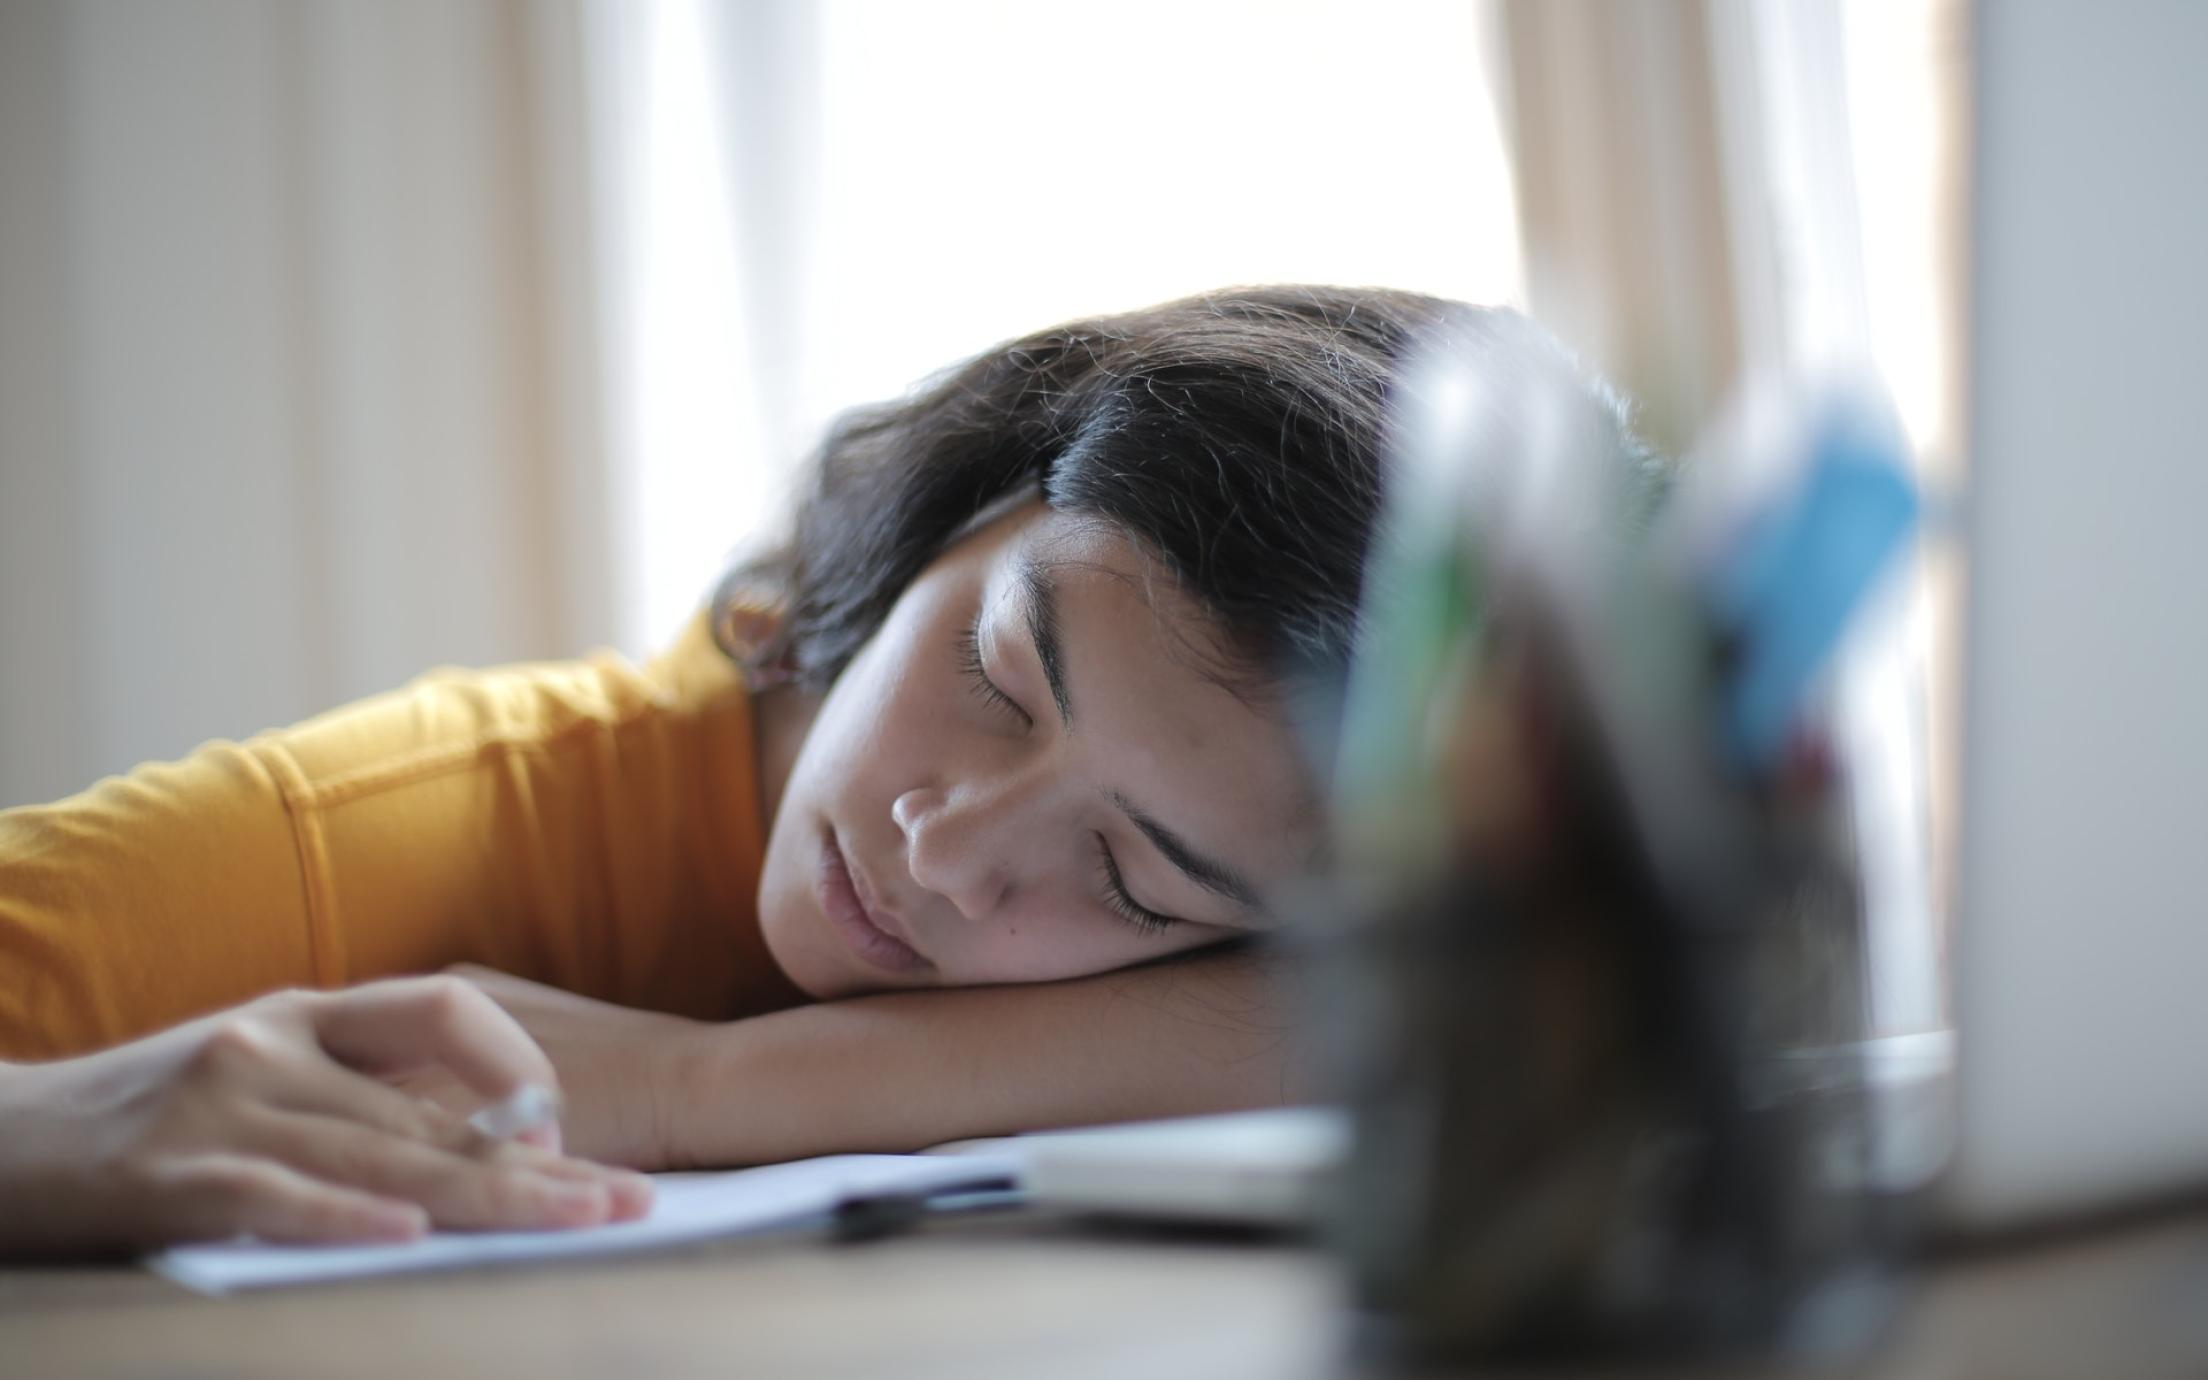 Student sleeping on her books